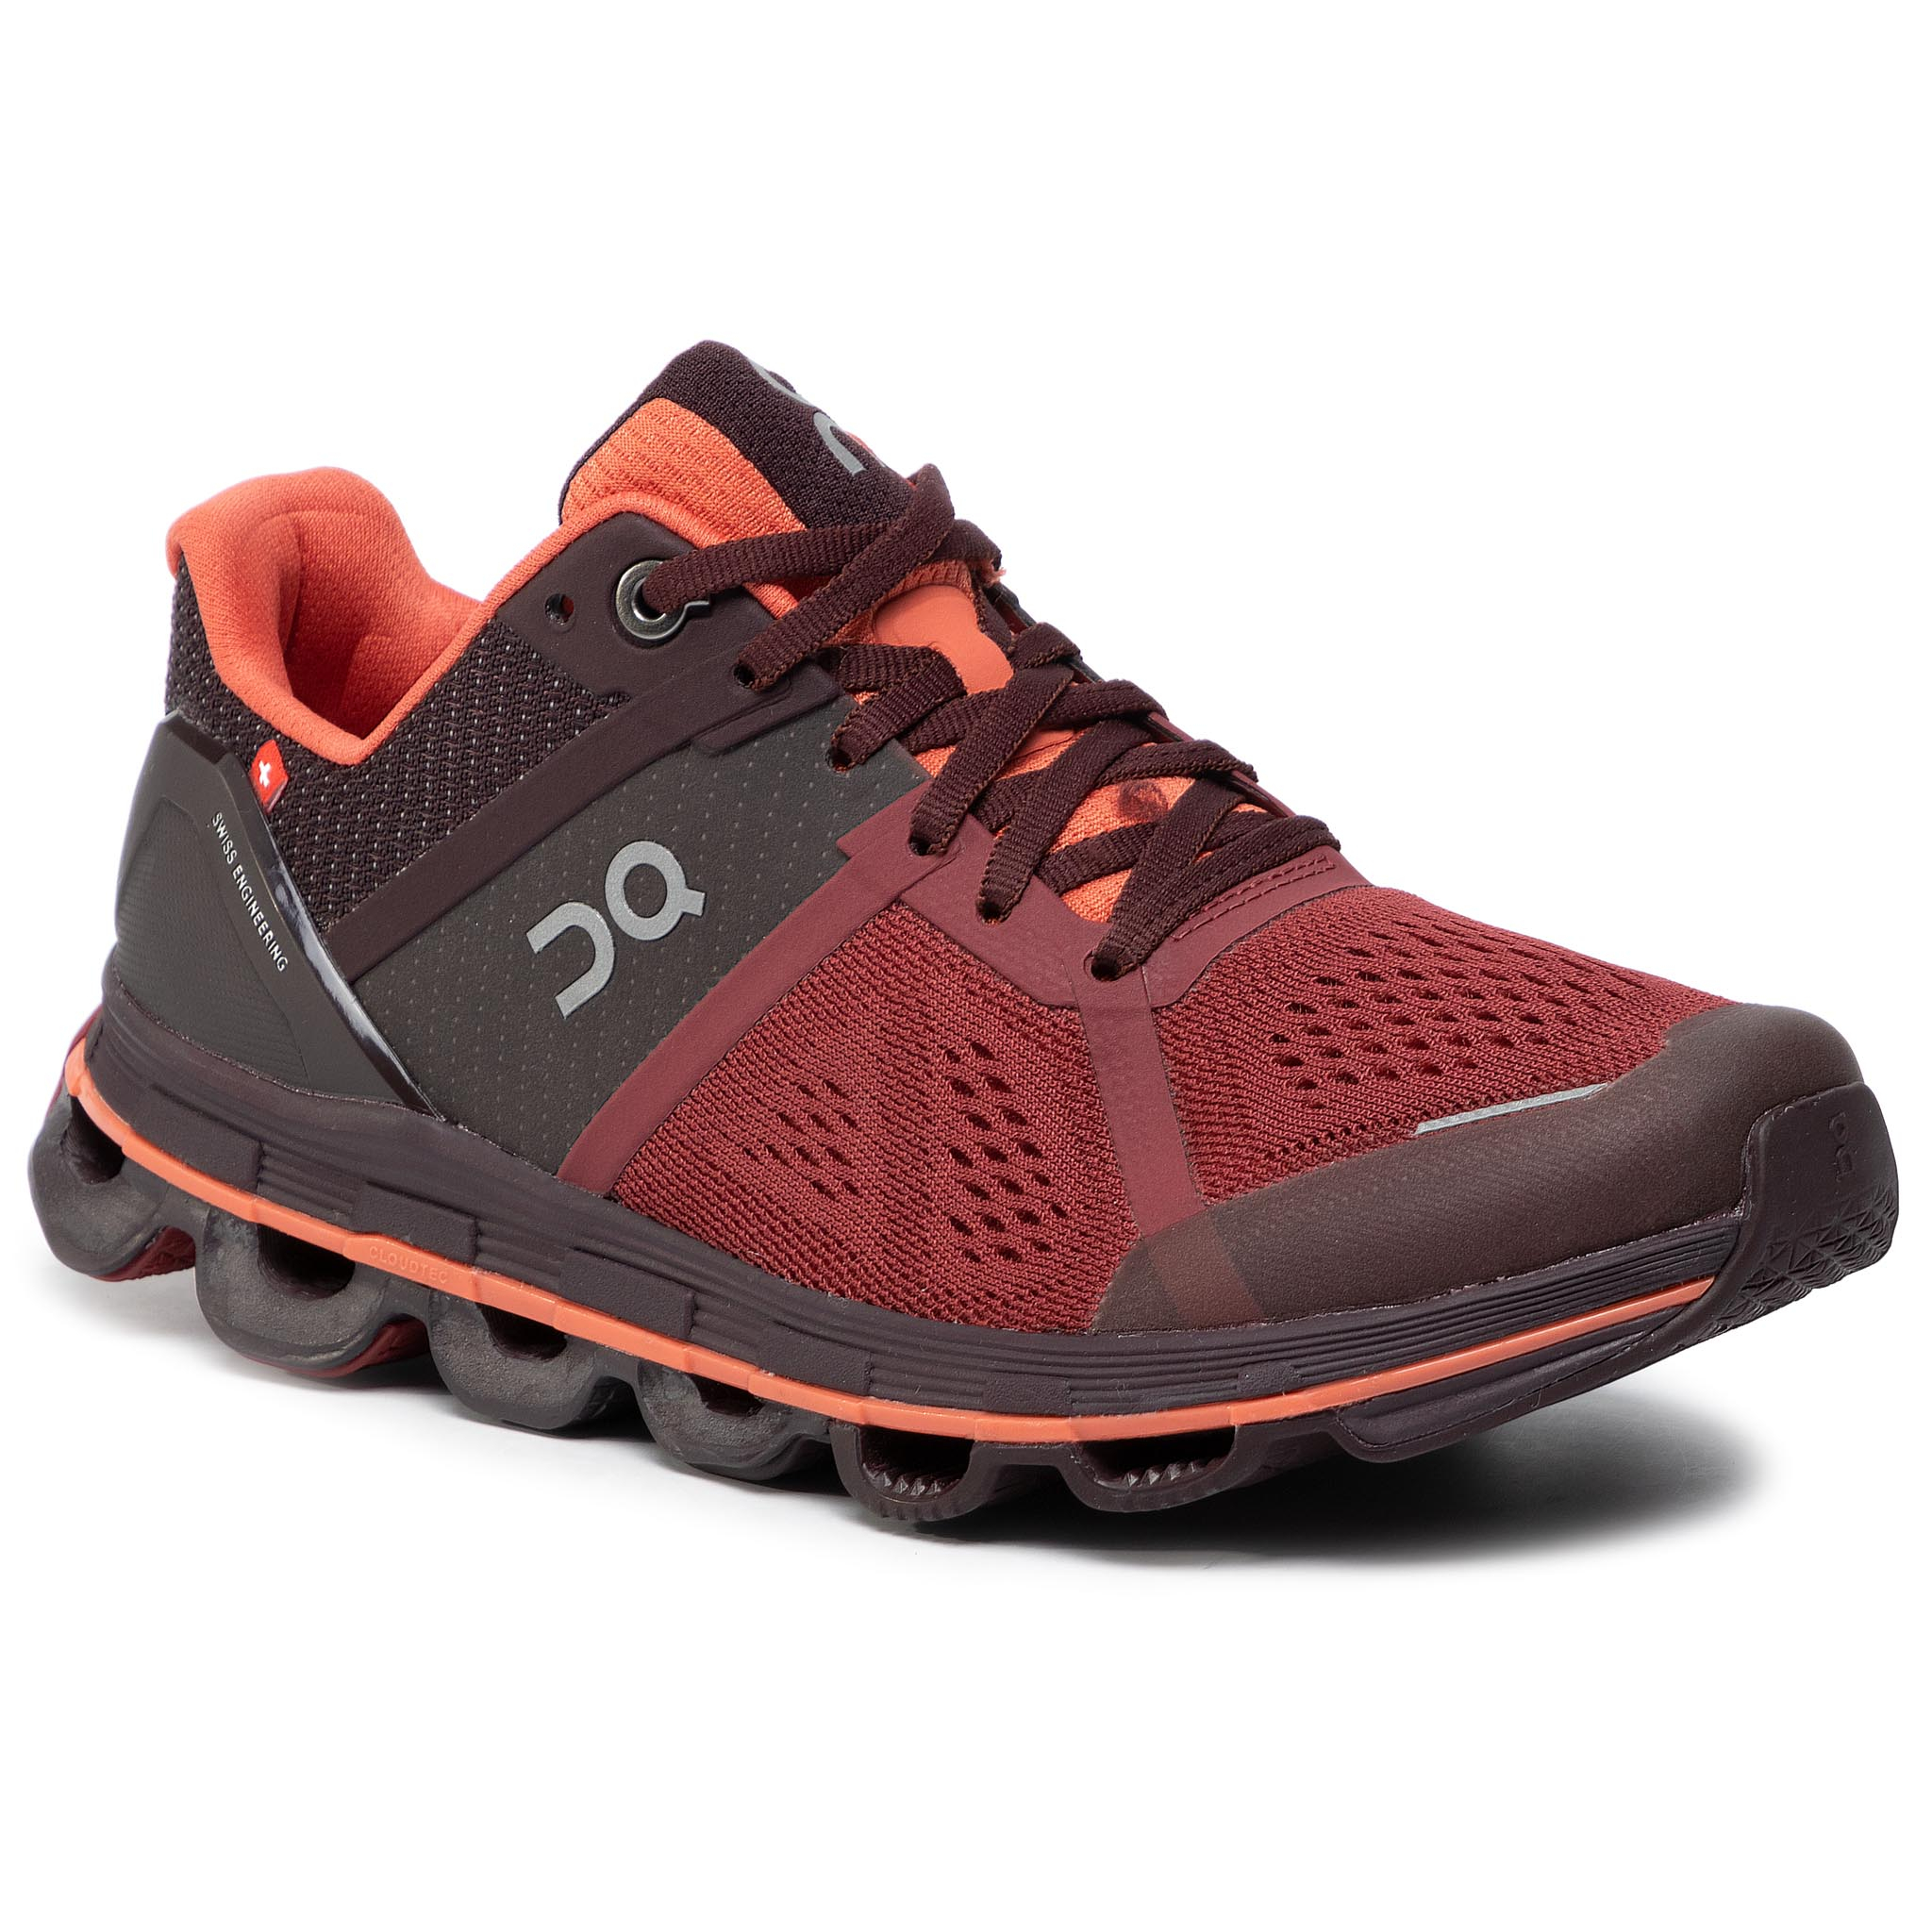 Schuhe SALOMON Xa Discovery Gtx GORE TEX 406802 27 W0 Sky